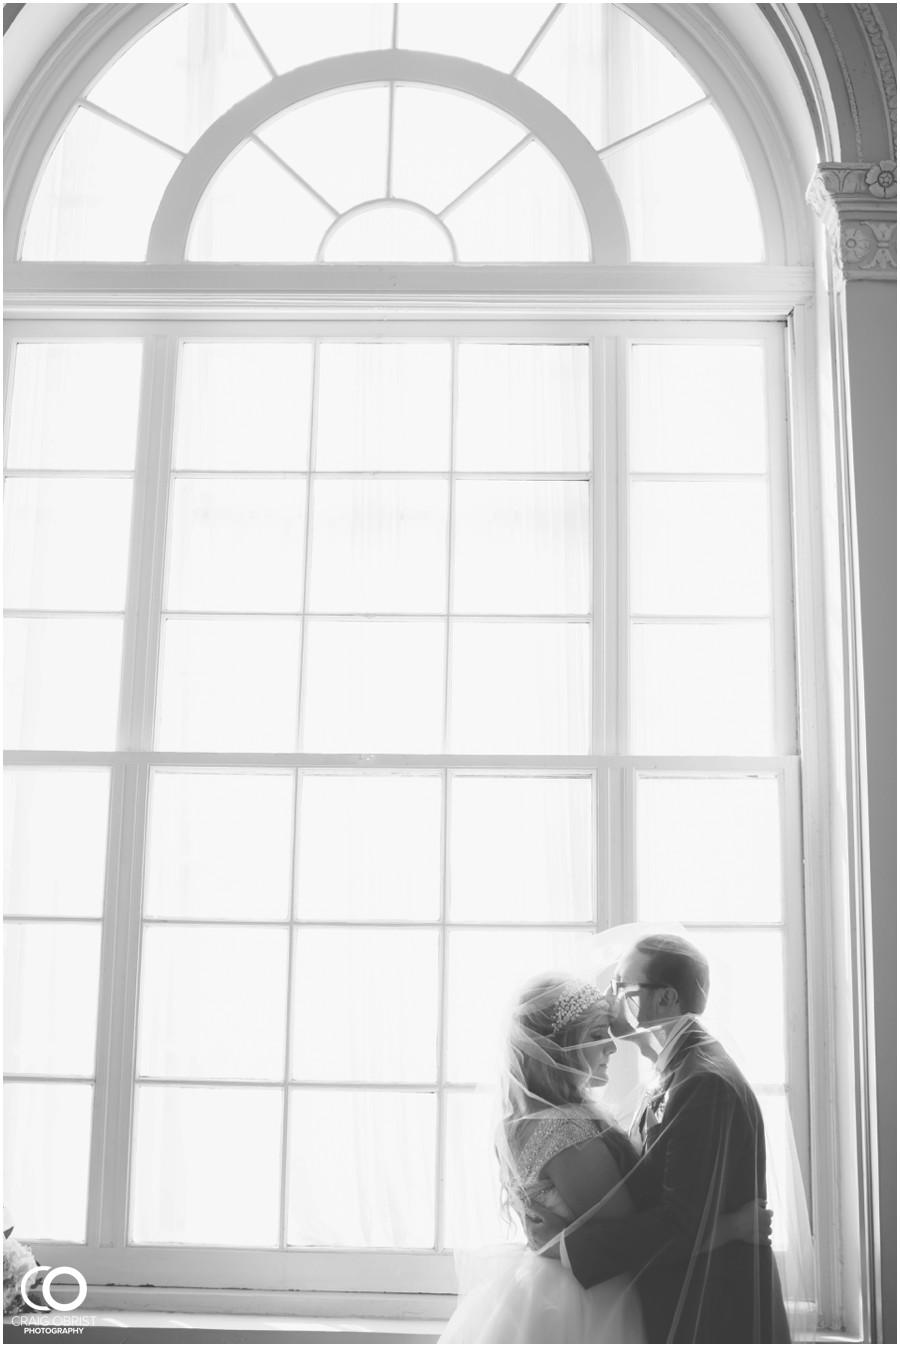 W Atlanta Biltmore Wedding Portraits_0076.jpg